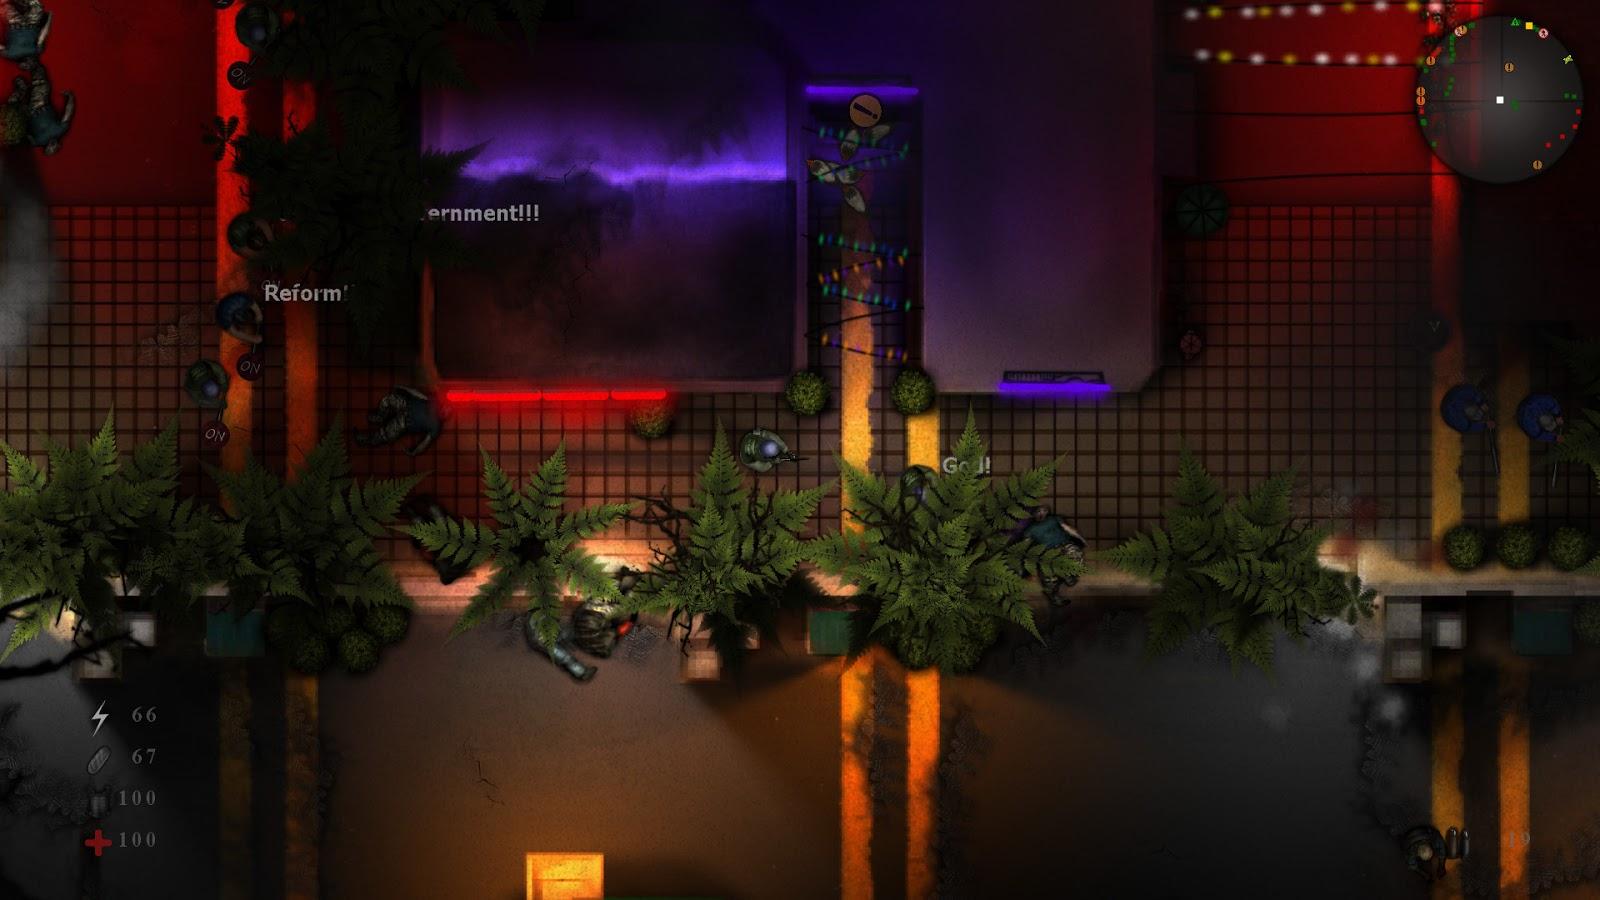 infected-zone-pc-screenshot-01